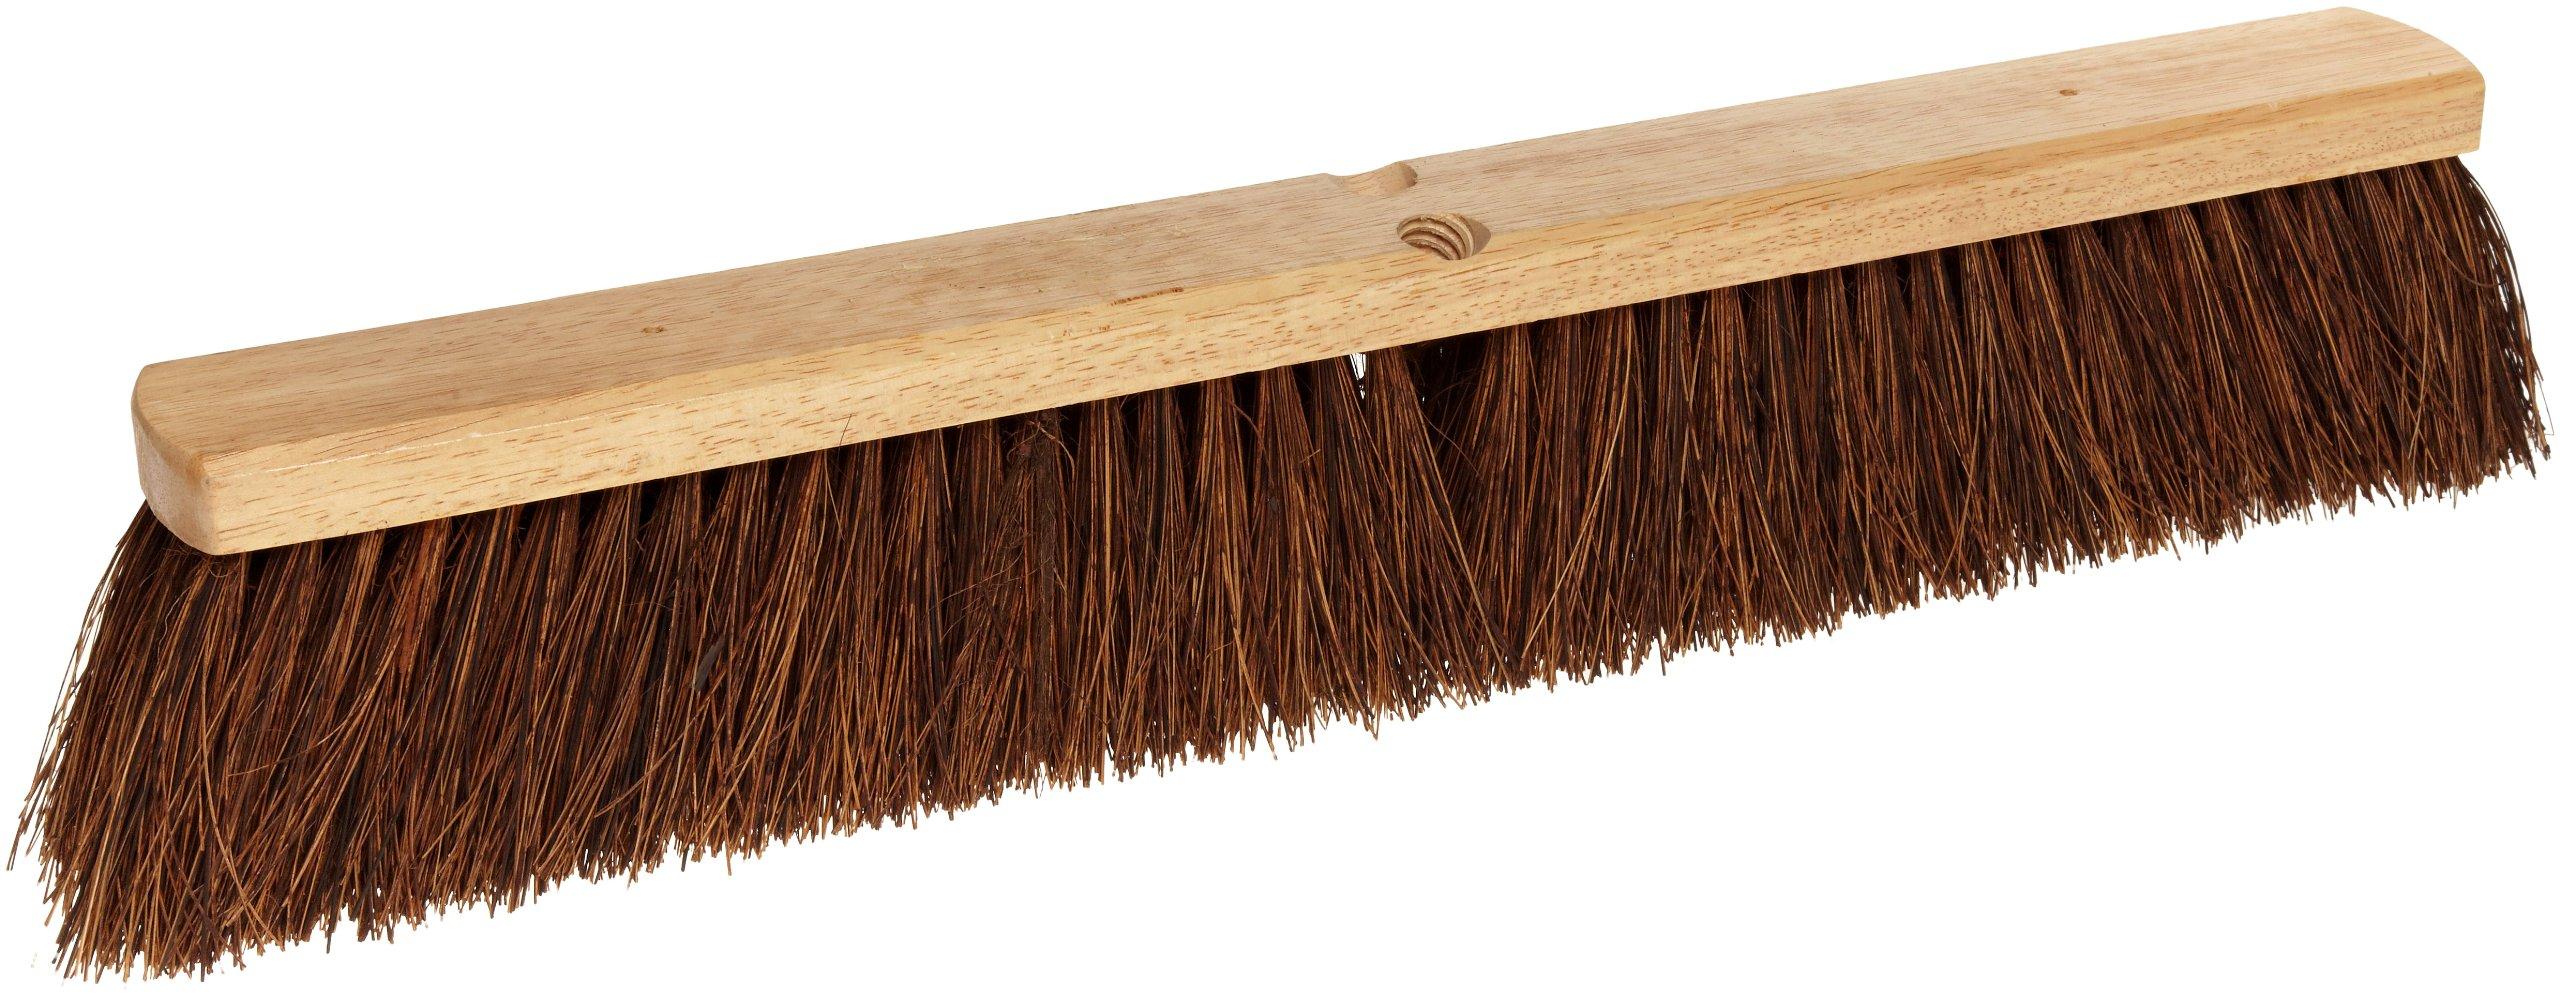 No. 14 Line Garage Brushes - 24'' palmyra garage brushless handle